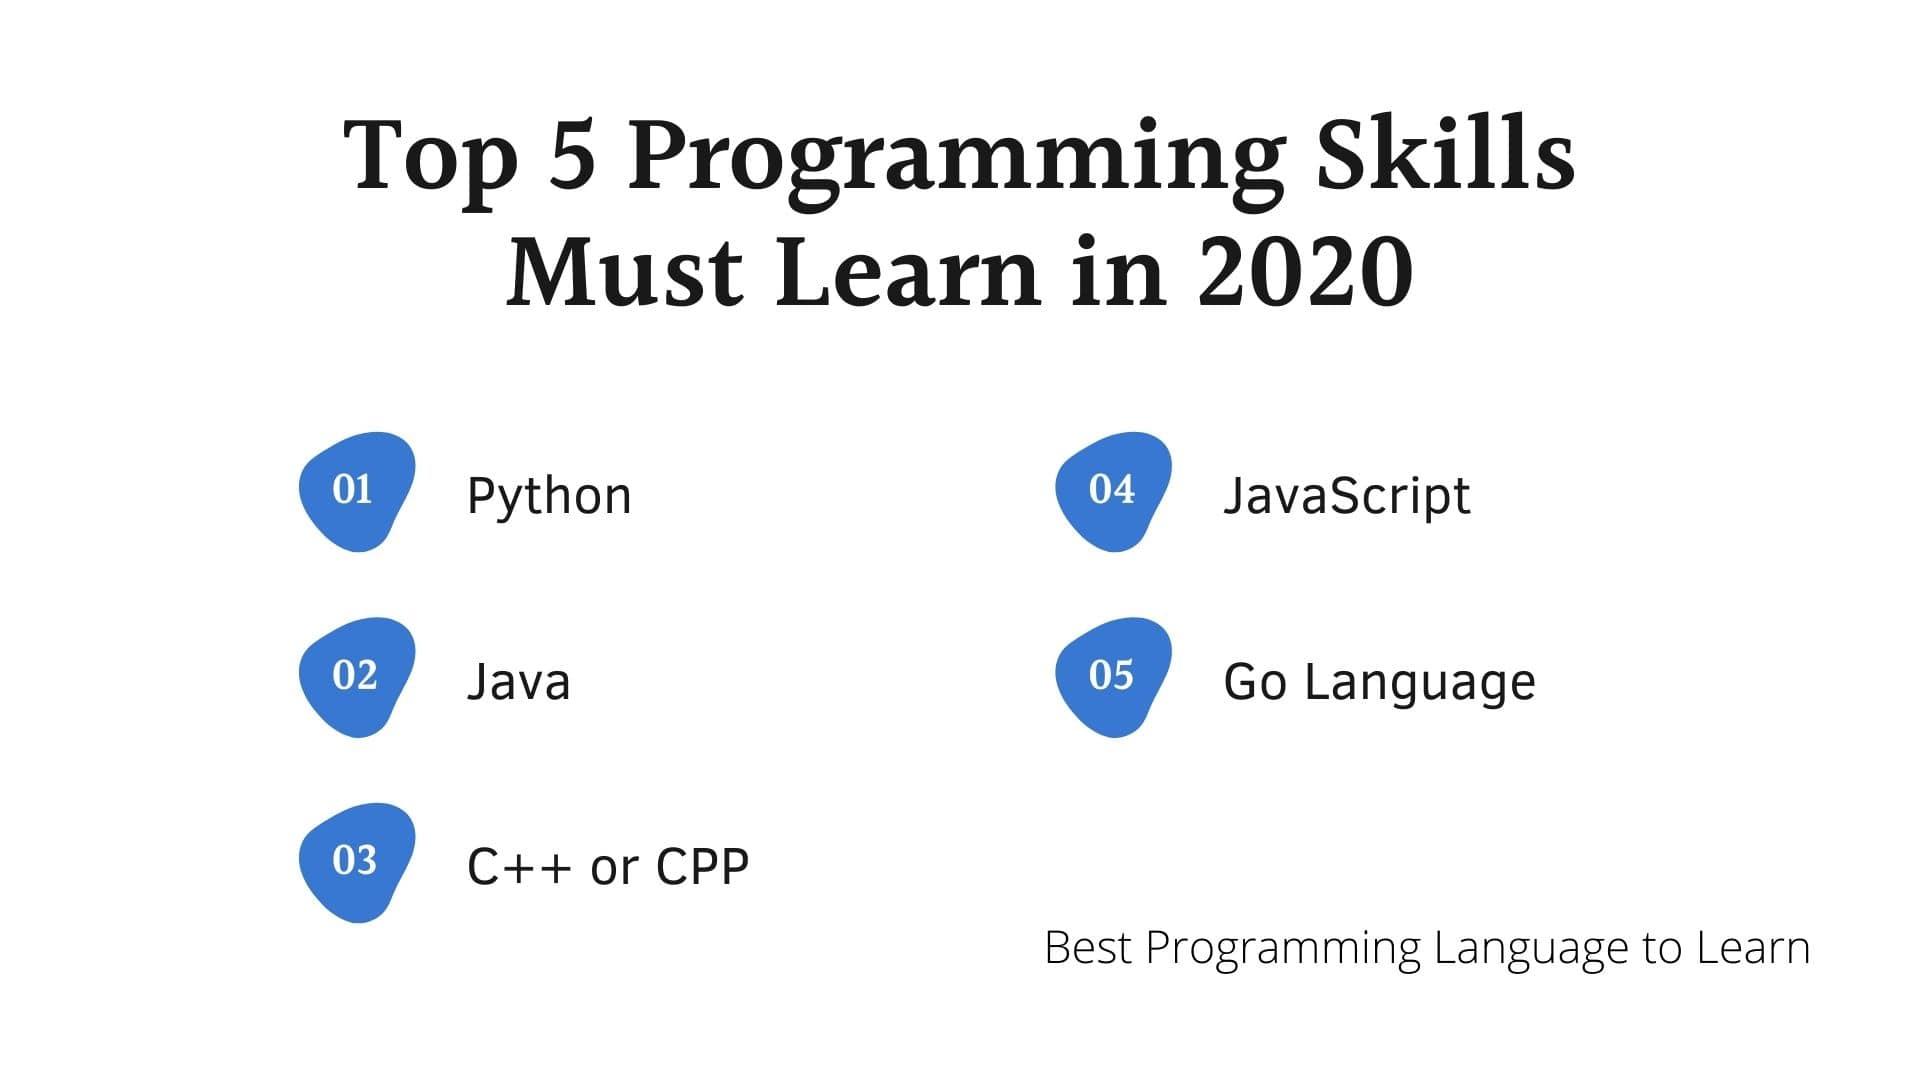 Top 5 Programming Skills